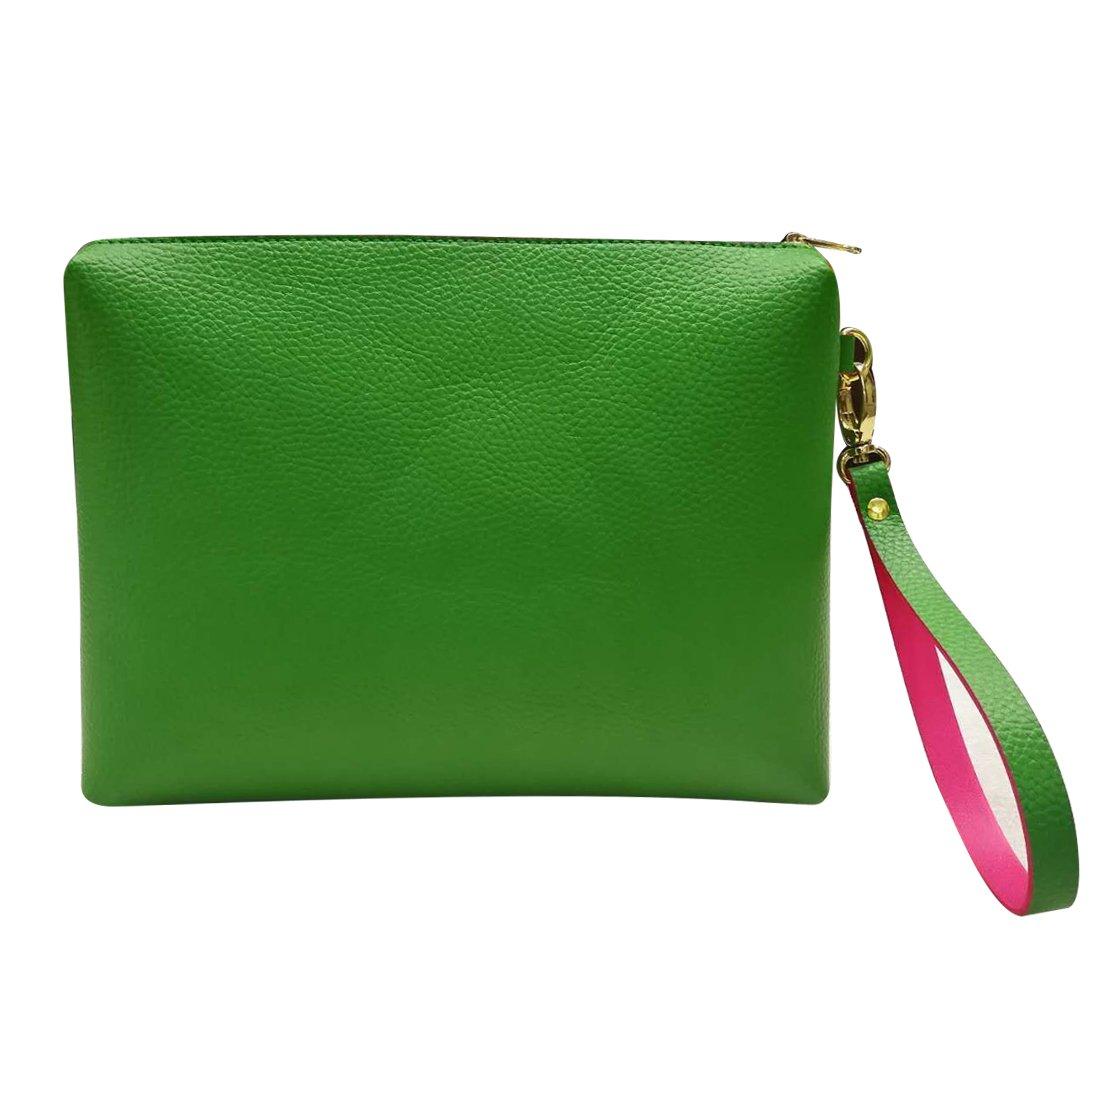 Women's Leather Wristlet Clutch Bag Evening Makeup Bag Large Capacity & Cosmetic Bag Wallet